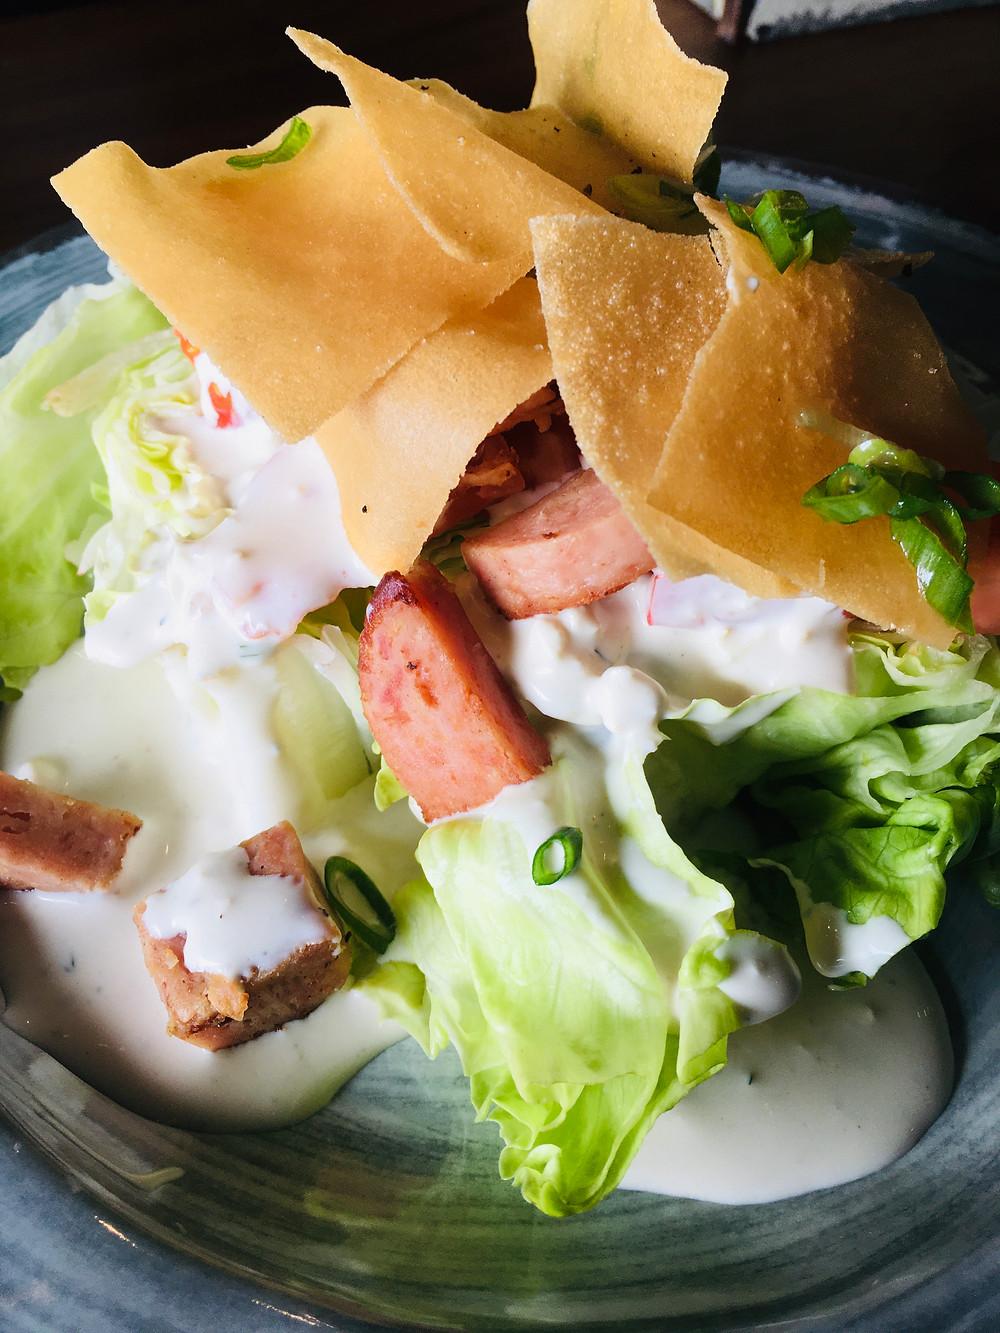 Filipino Wedge Salad from Barkada's restaurant